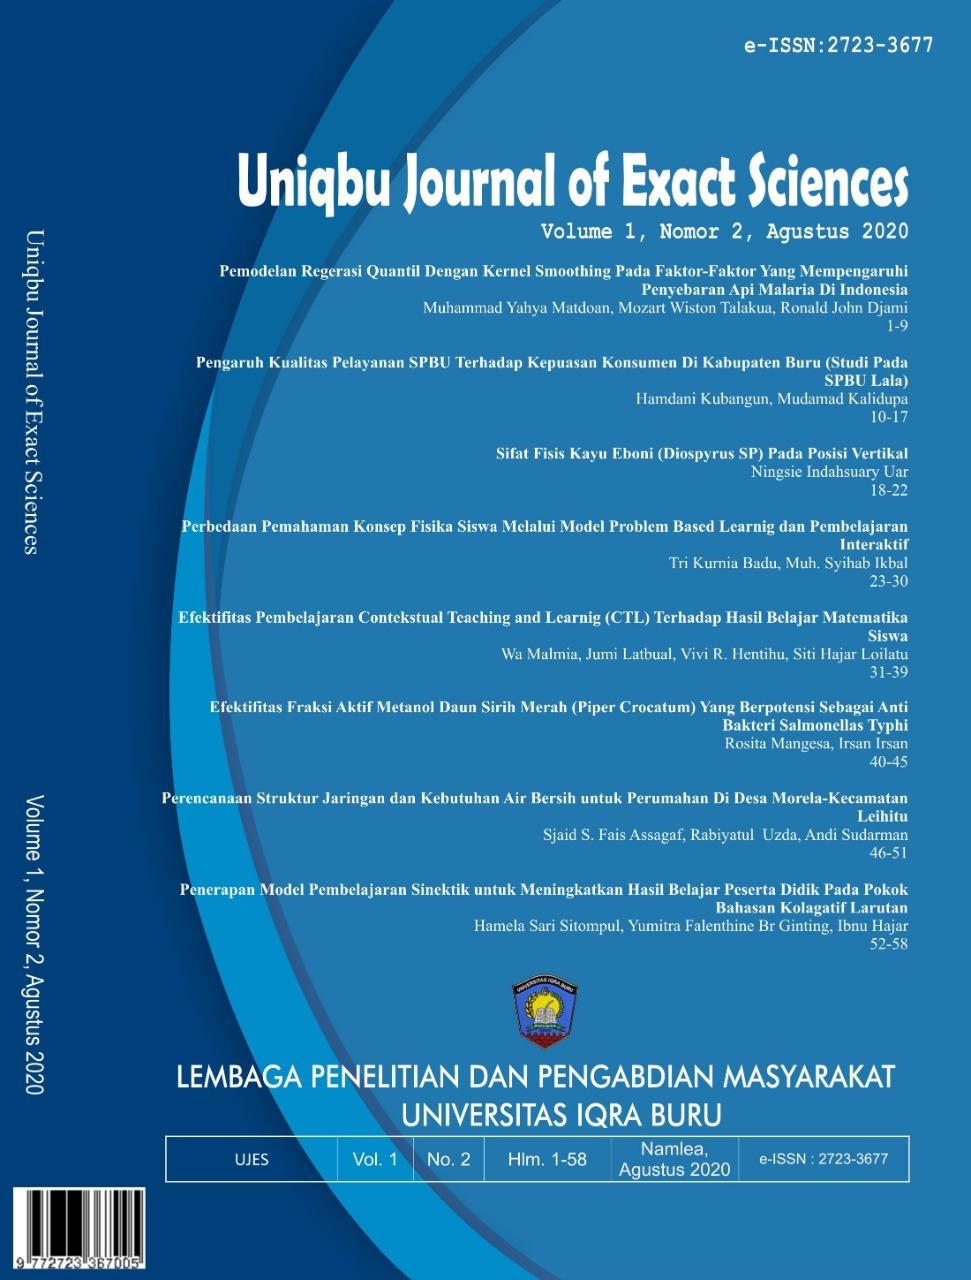 View Vol. 1 No. 2 (2020): Uniqbu Journal of Exact Sciences